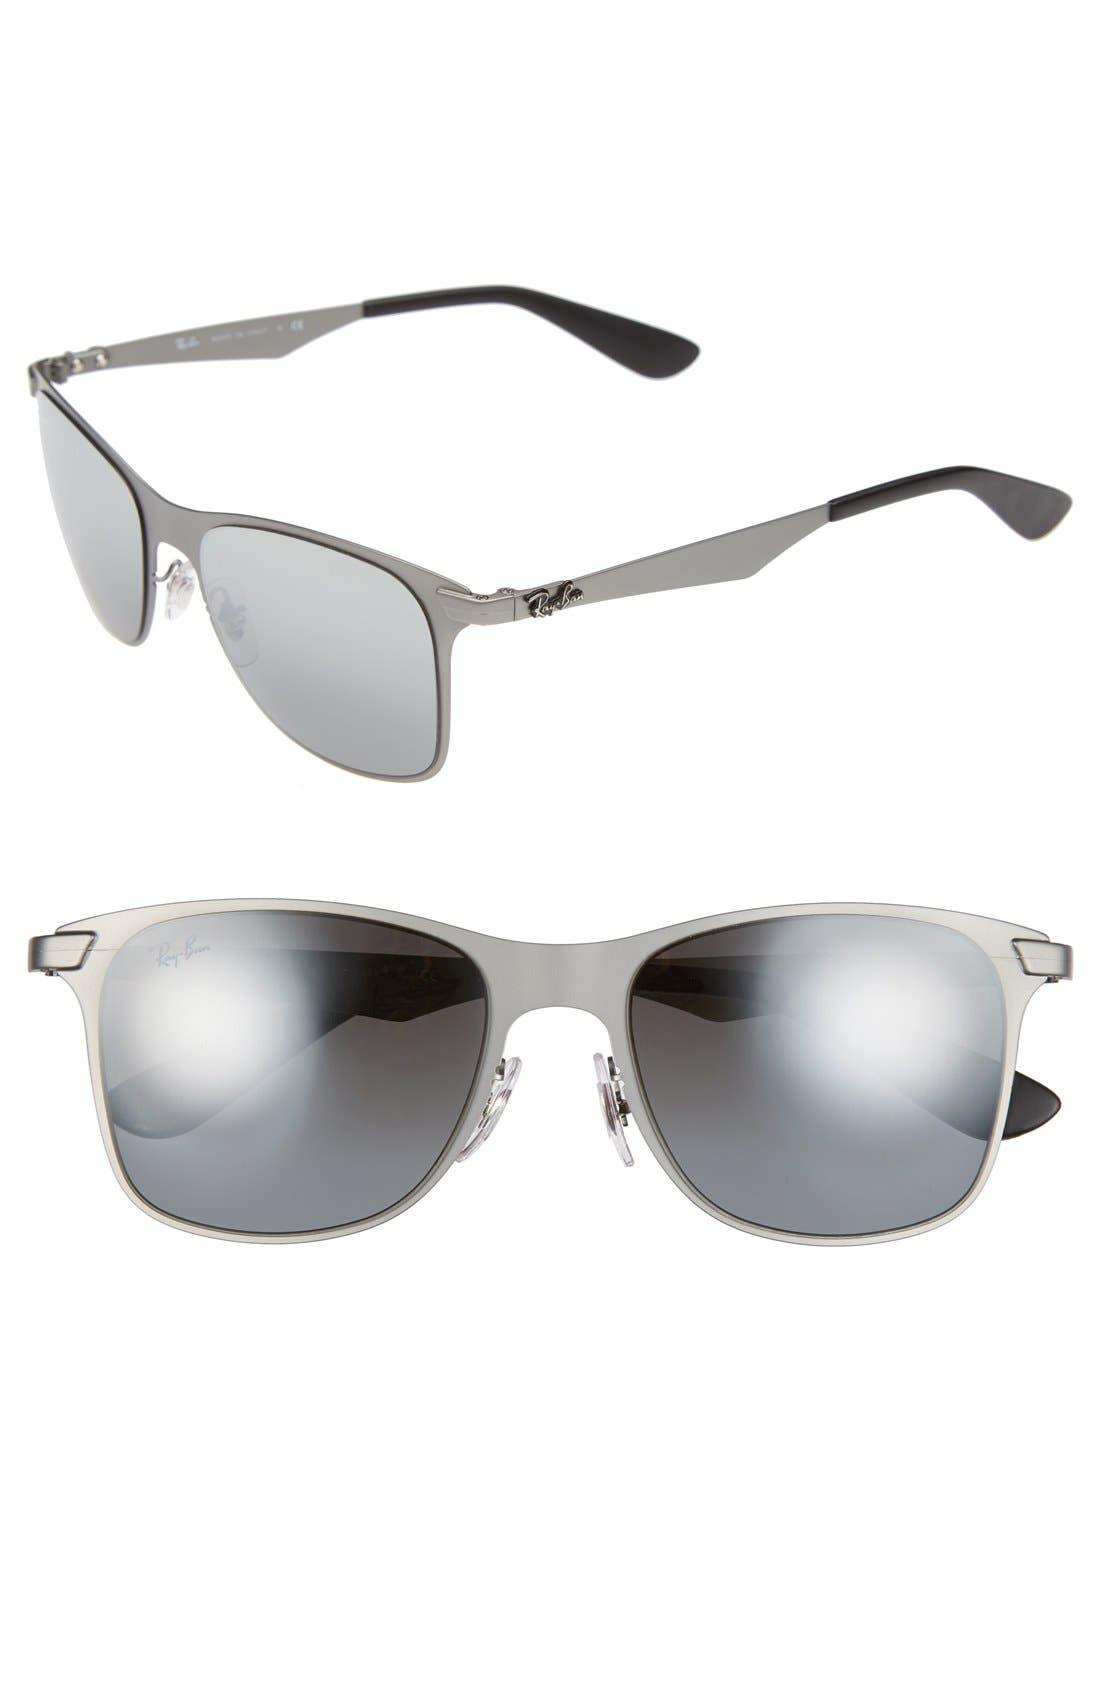 Main Image - Ray-Ban 'Steel Man' 52mm Sunglasses